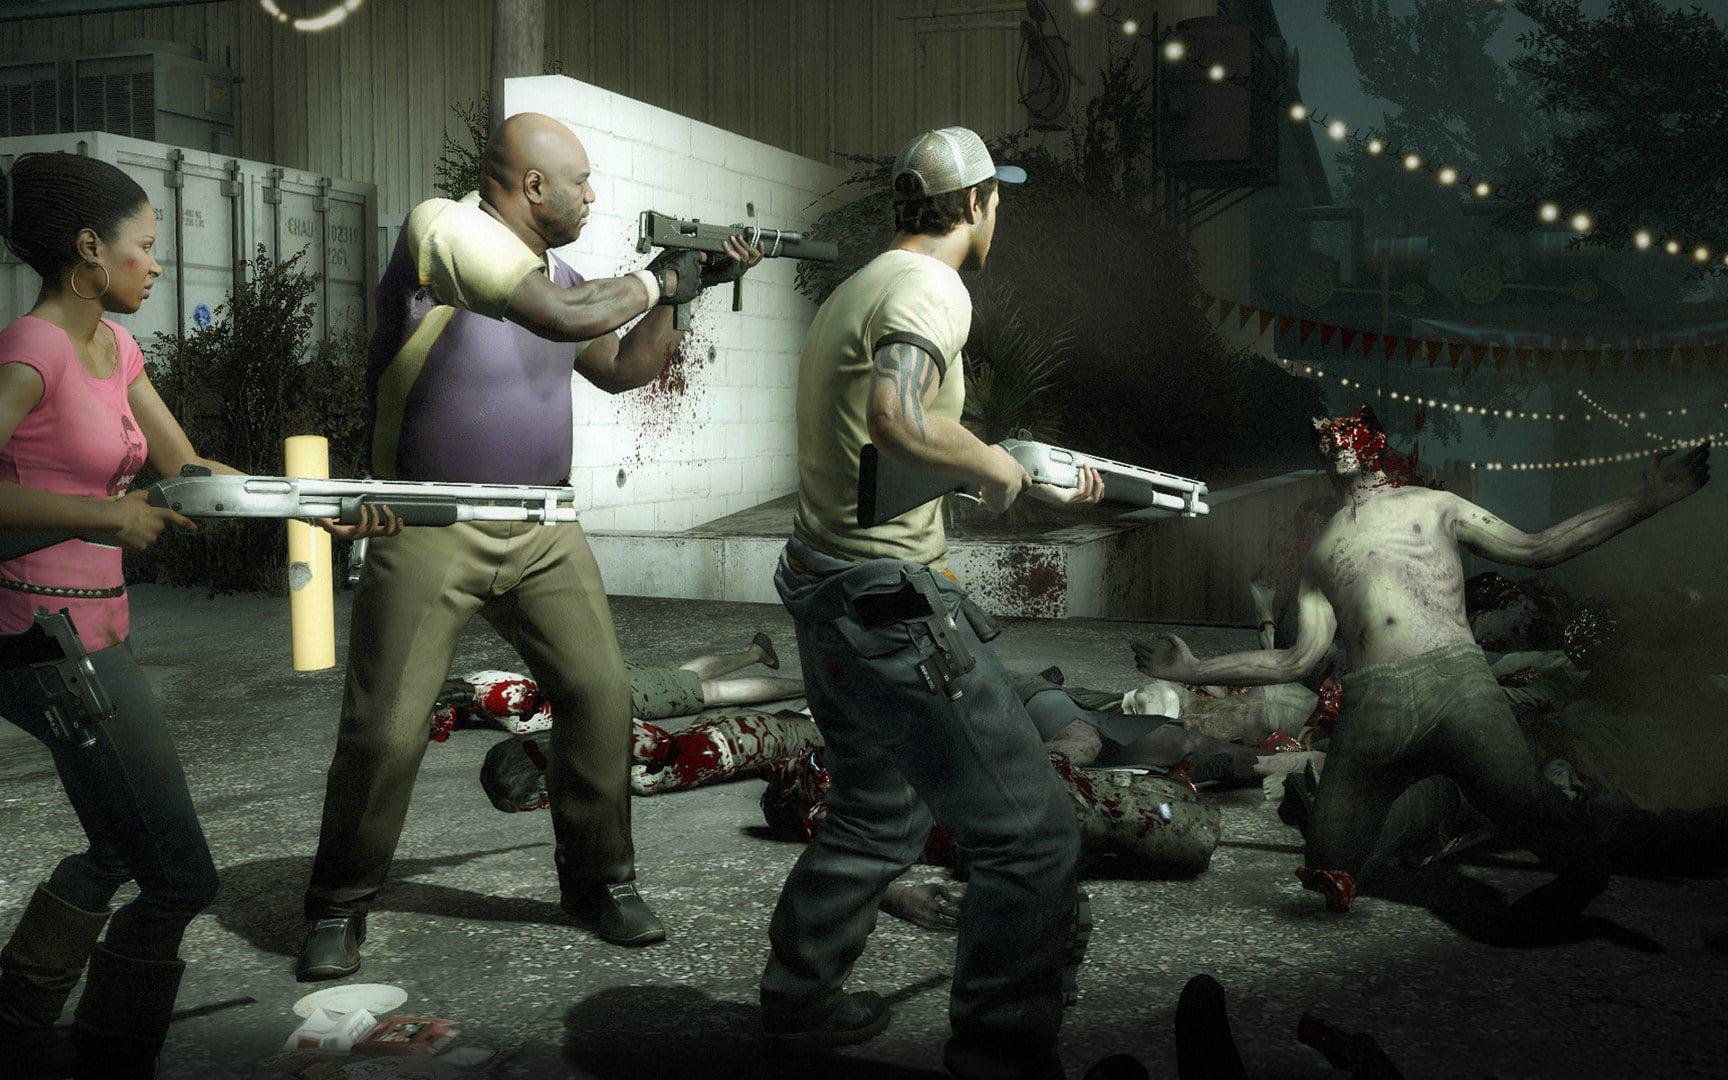 Back 4 Blood Turtle Rock Studios Left 4 Dead twist zombie carrier doom via The Sacrifice comic